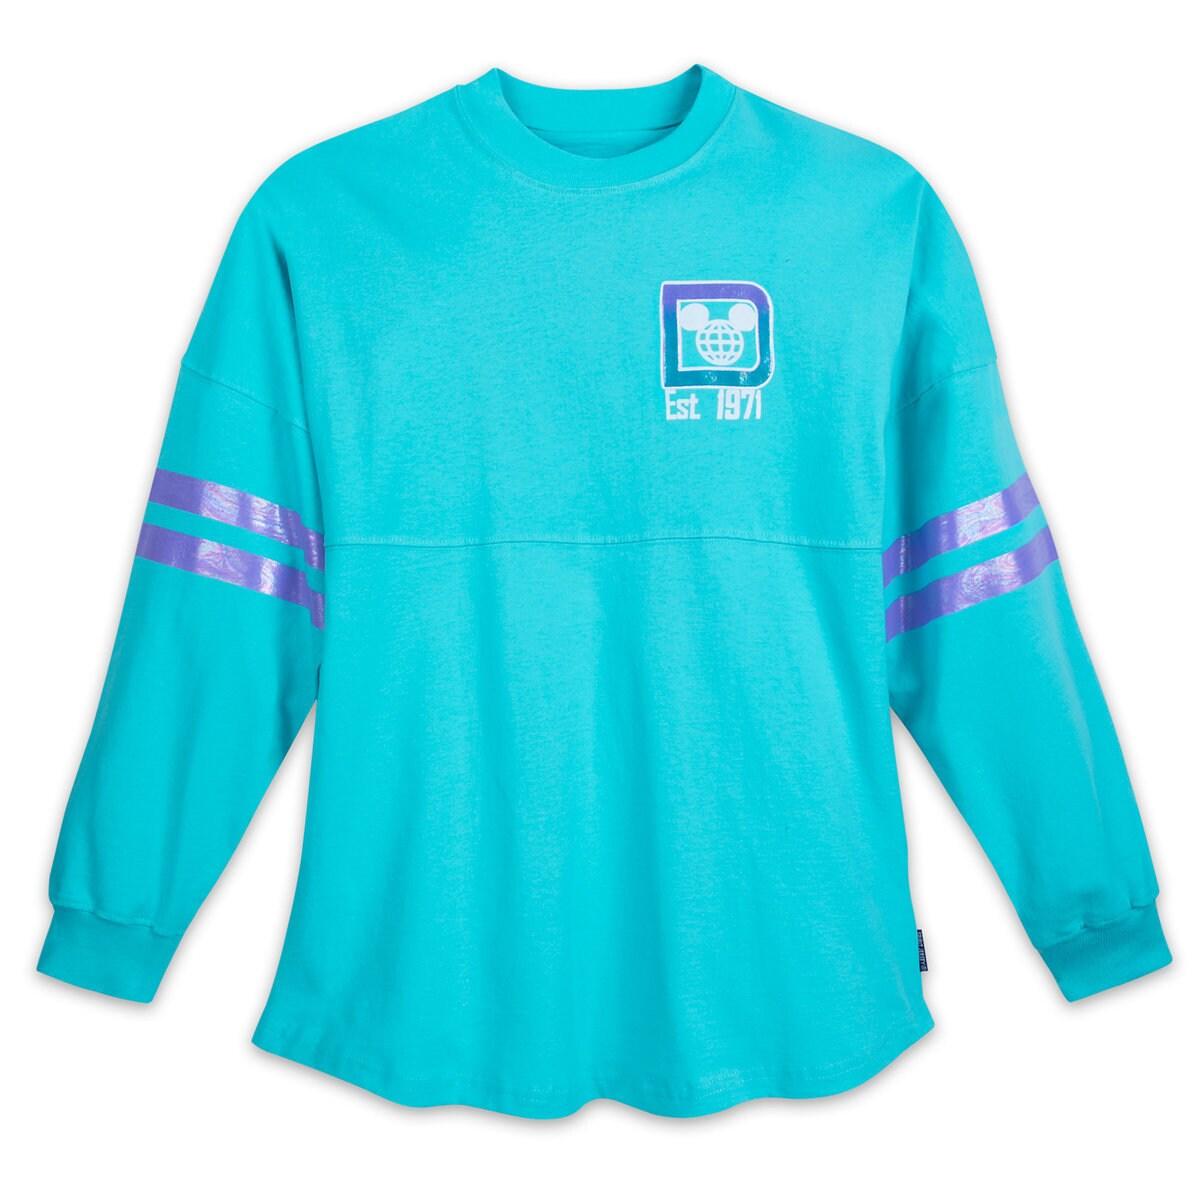 b962854b1 Product Image of Walt Disney World Spirit Jersey for Women # 1